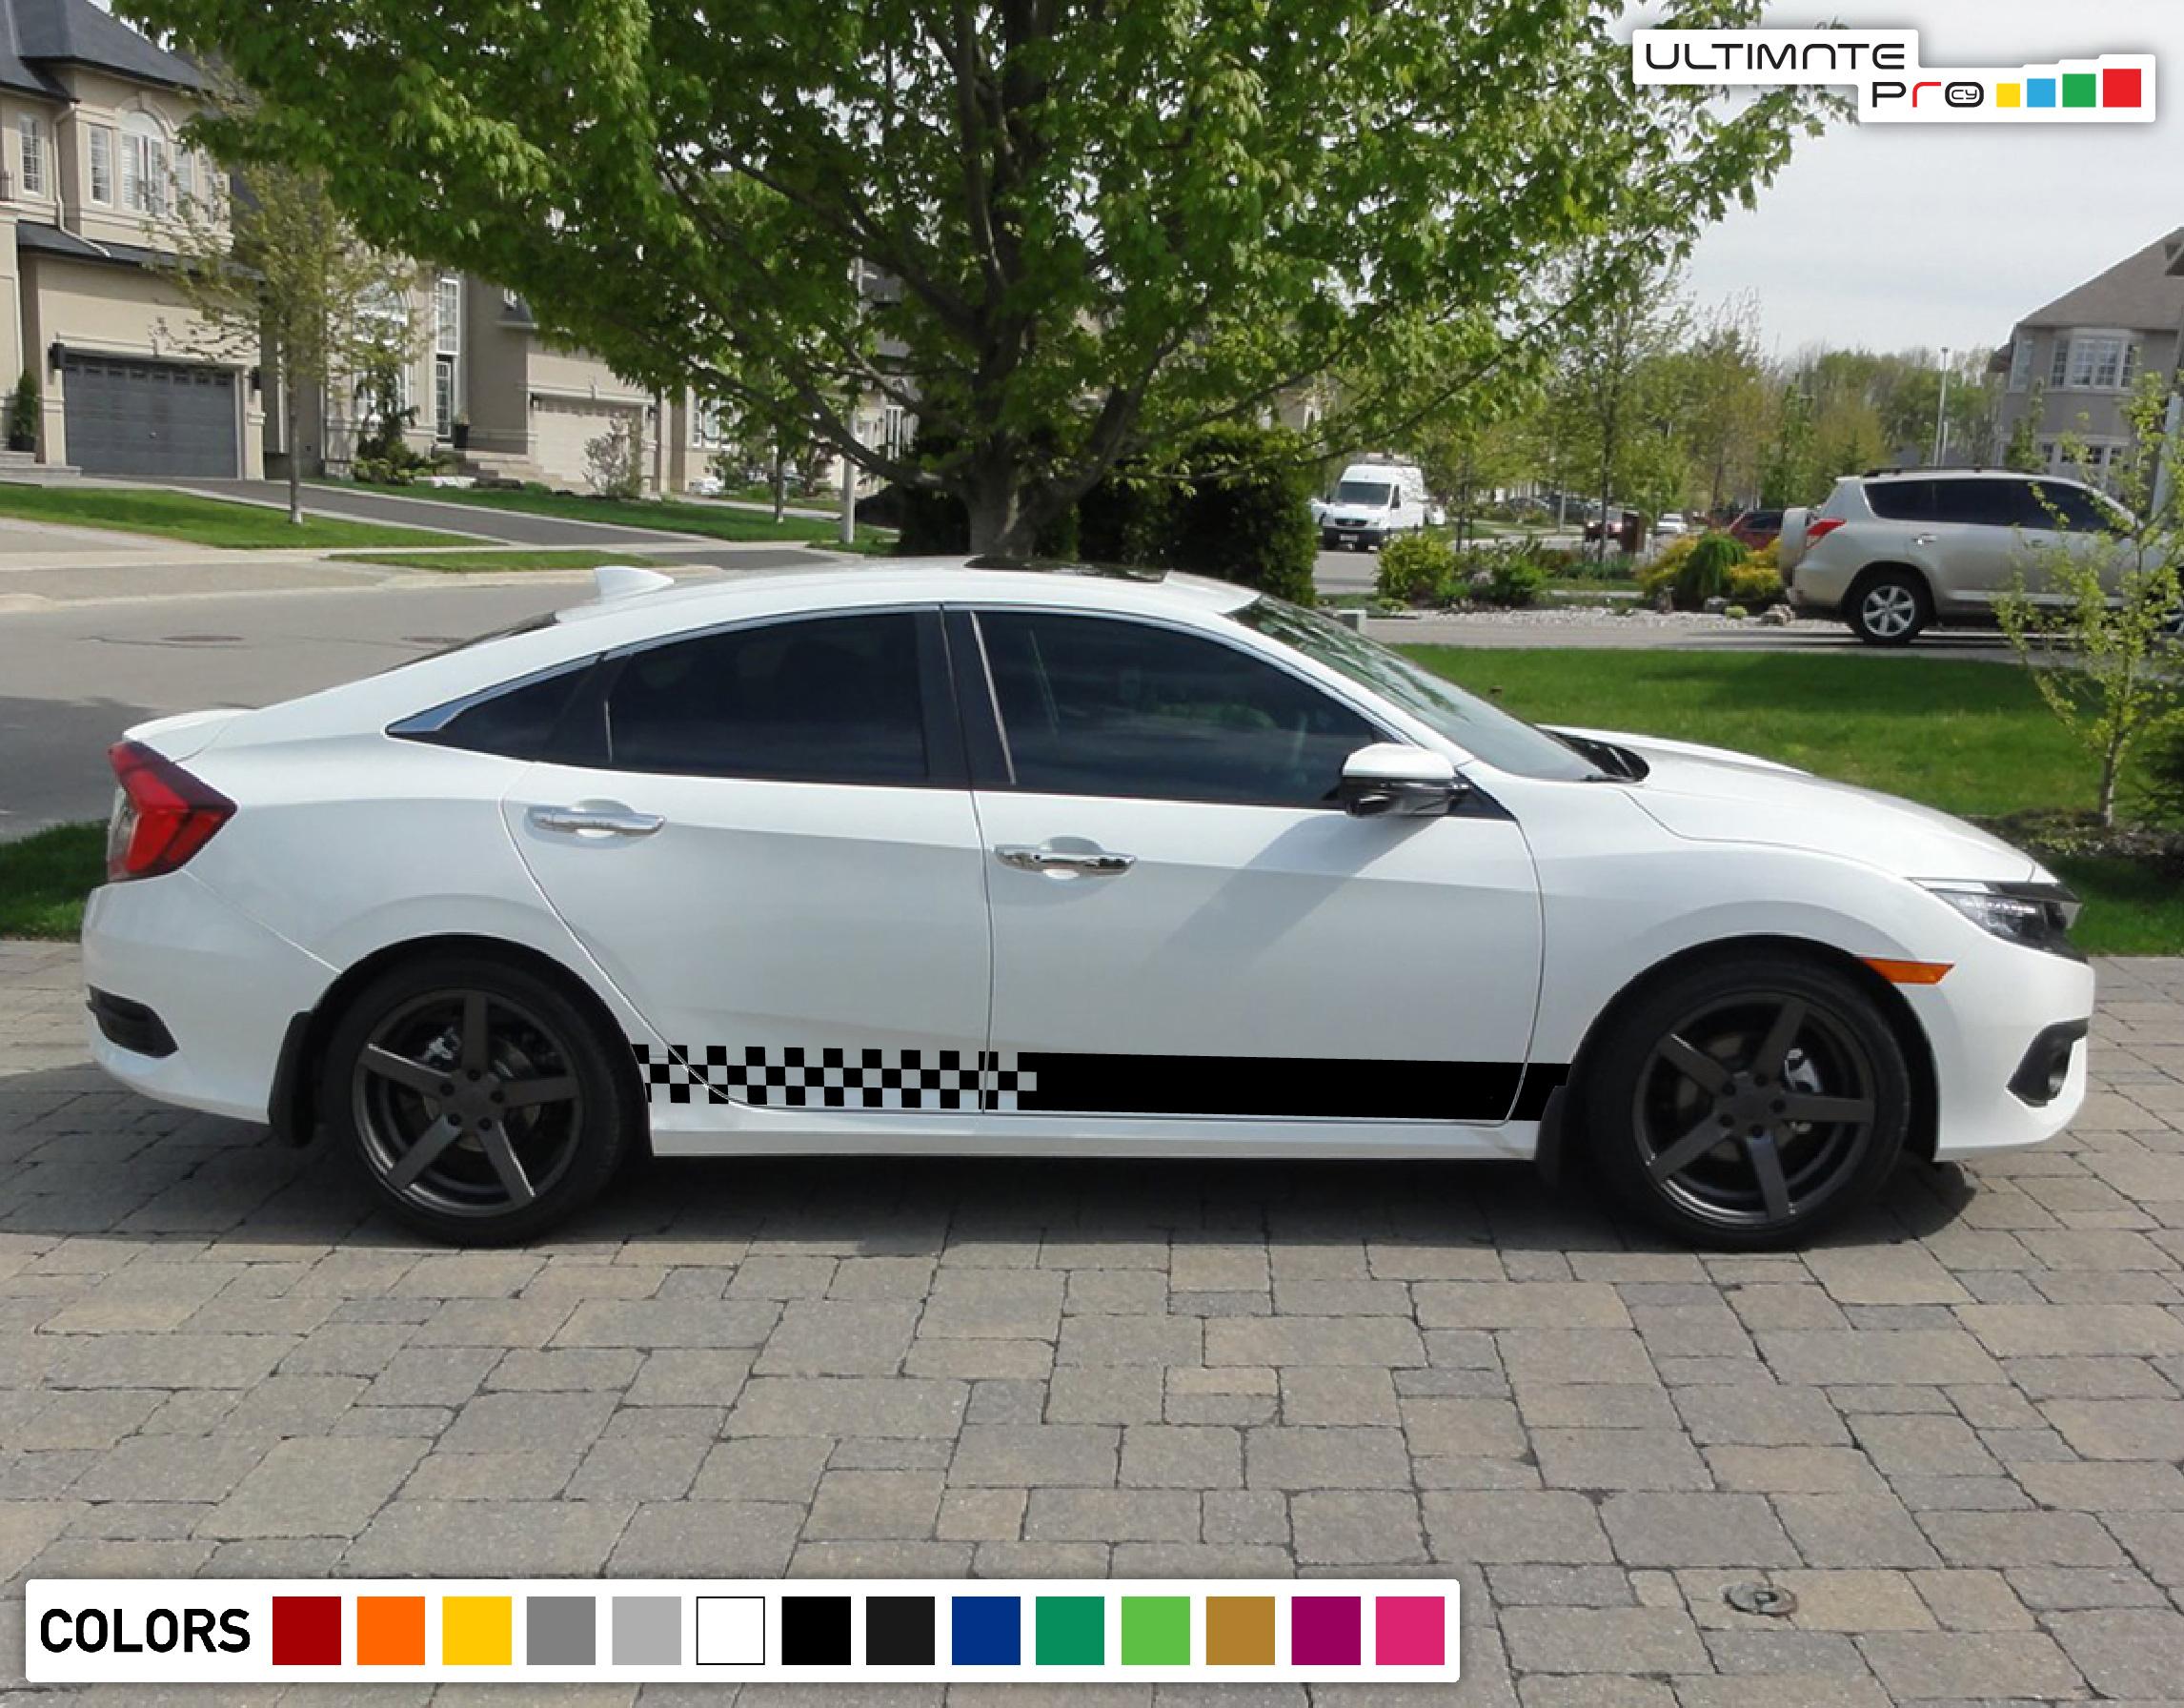 Sticker Decal Vinyl Side Door Stripes for Acura LTX Turbo 2016 2017 2018 2019 present sport fender body